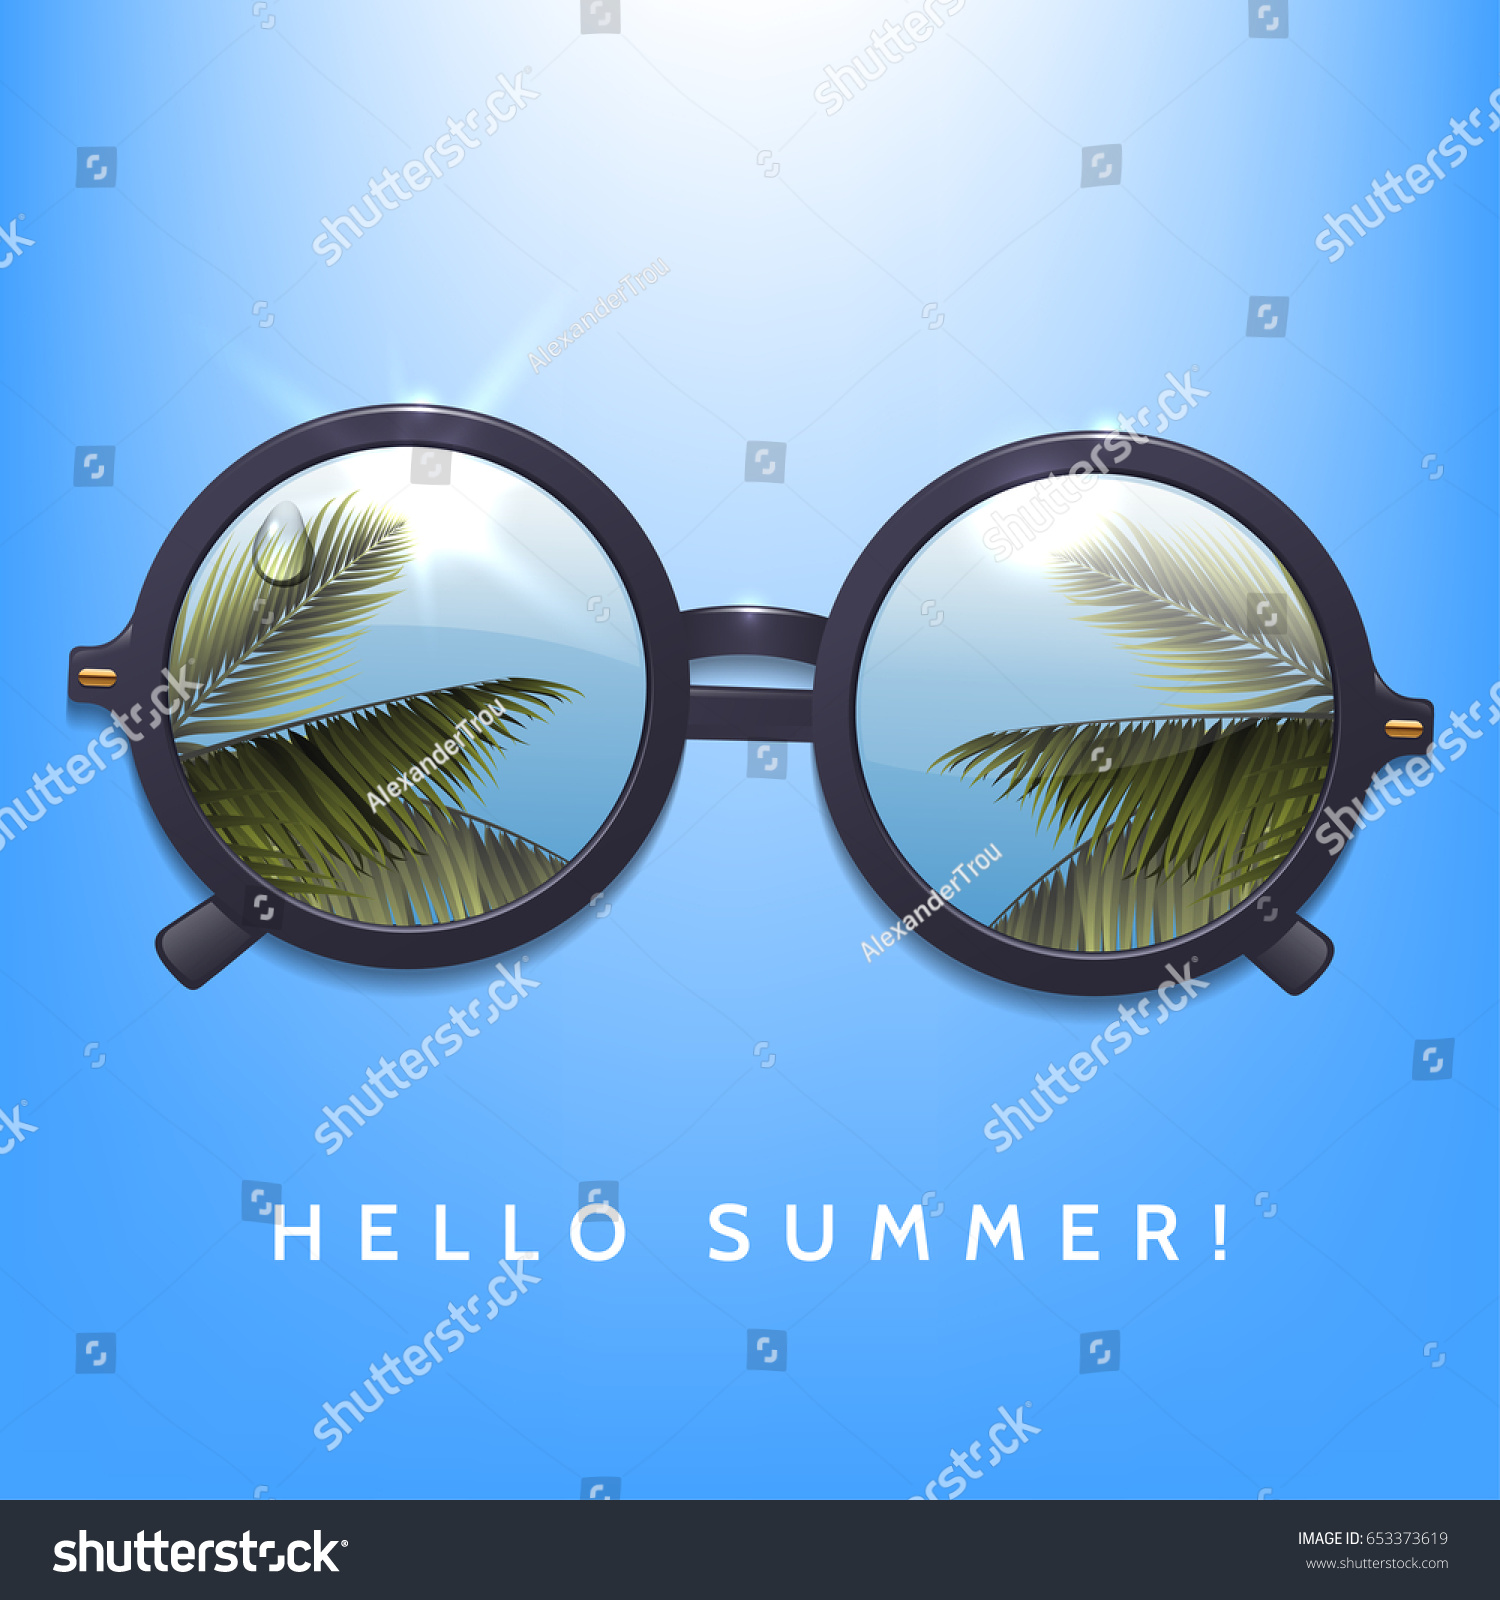 Hello Summer Illustration. Palms Reflection In Round Sunglasses. Blue Sky  Background.Flecks Of